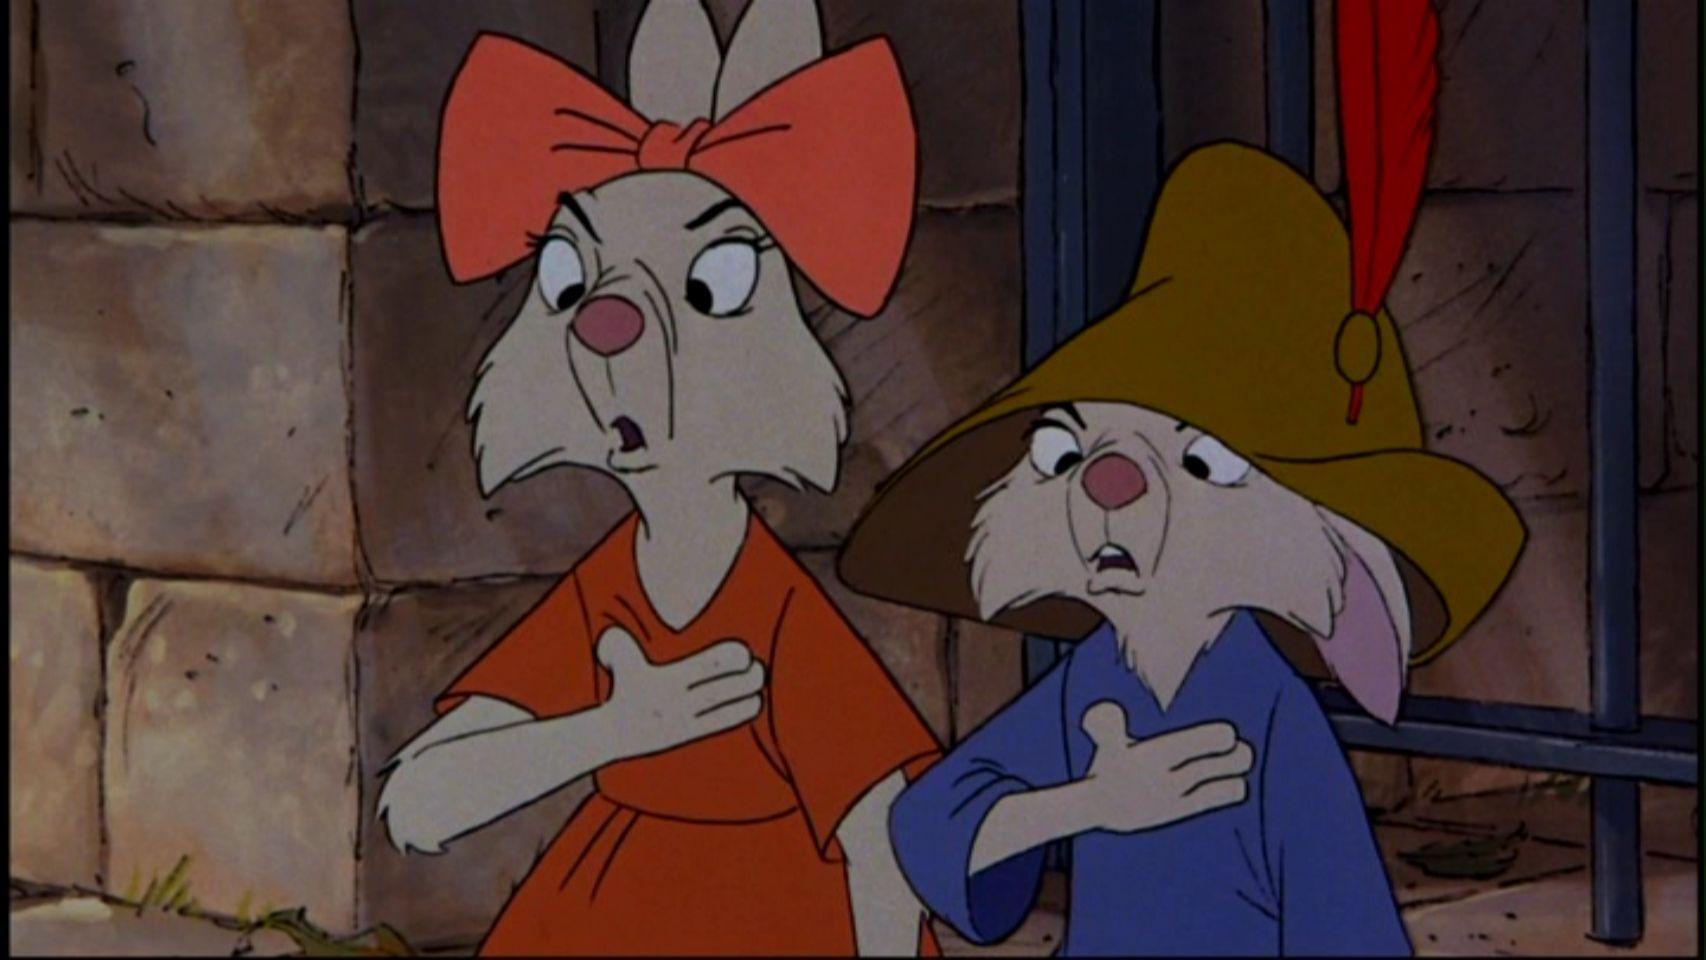 Disney Robin Hood Robin Hood Disney Image 19770573 Fanpop